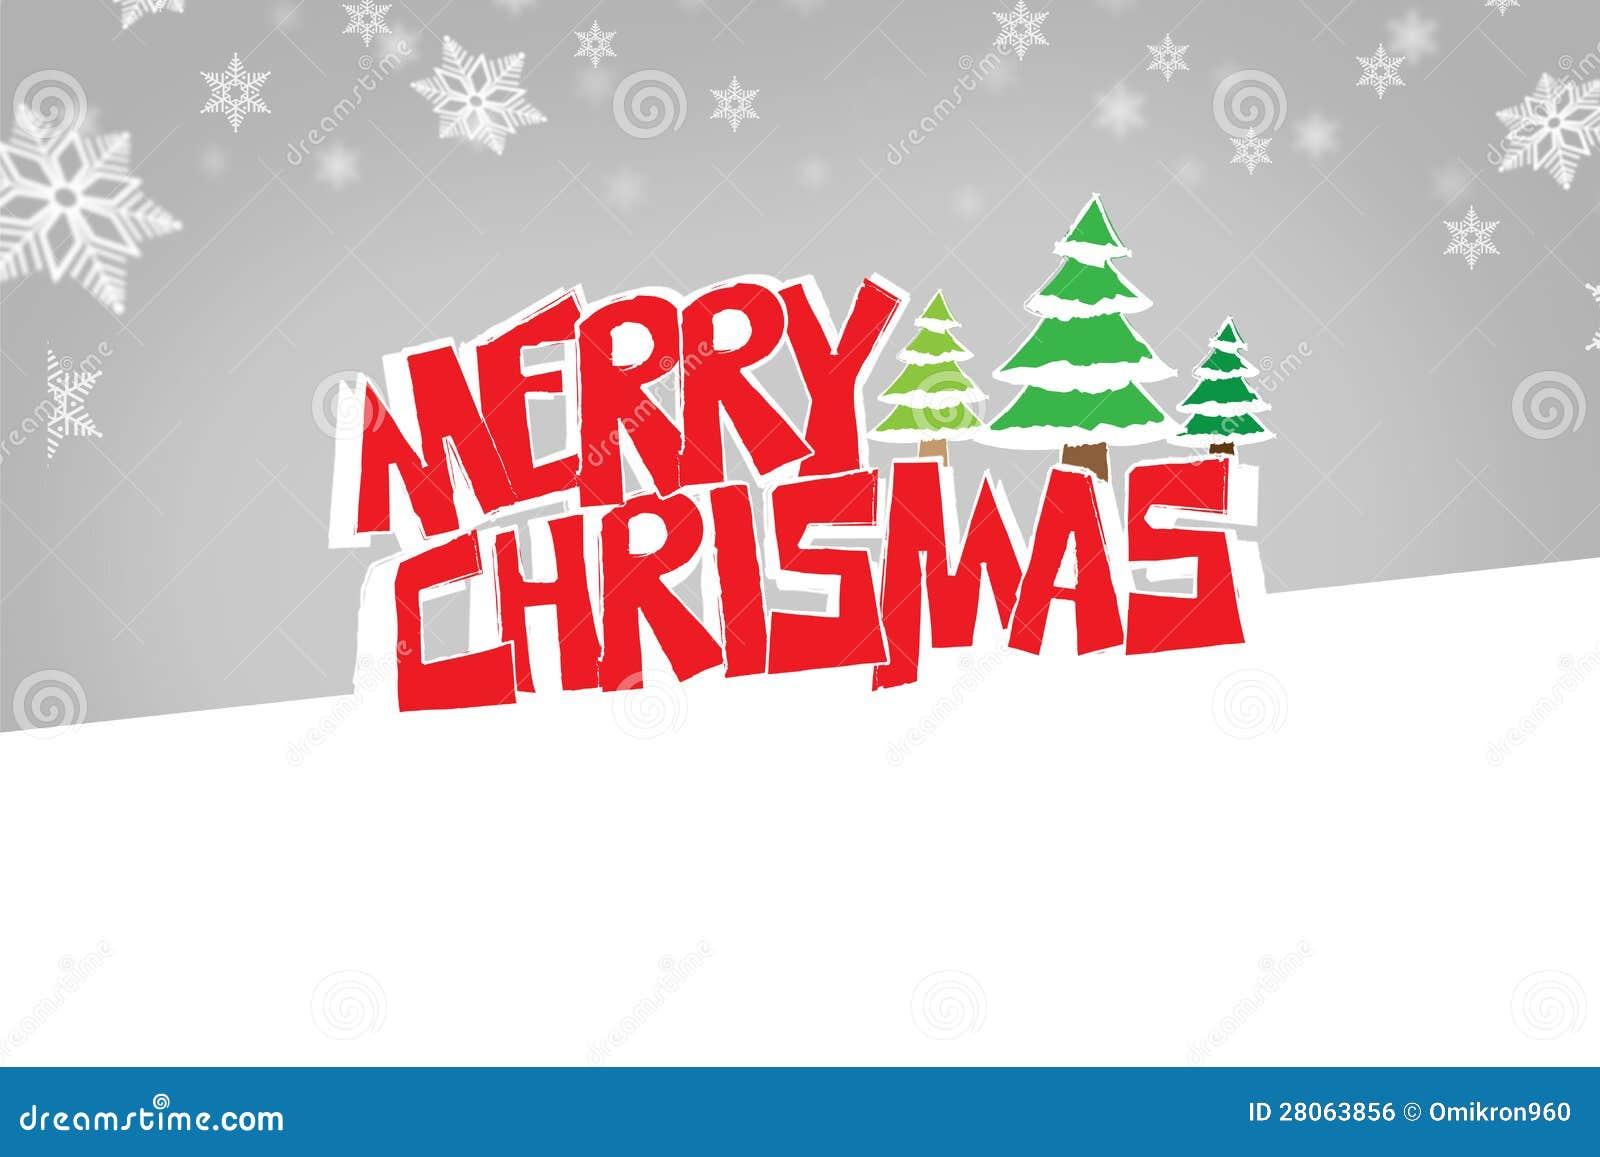 merry christmas logos free